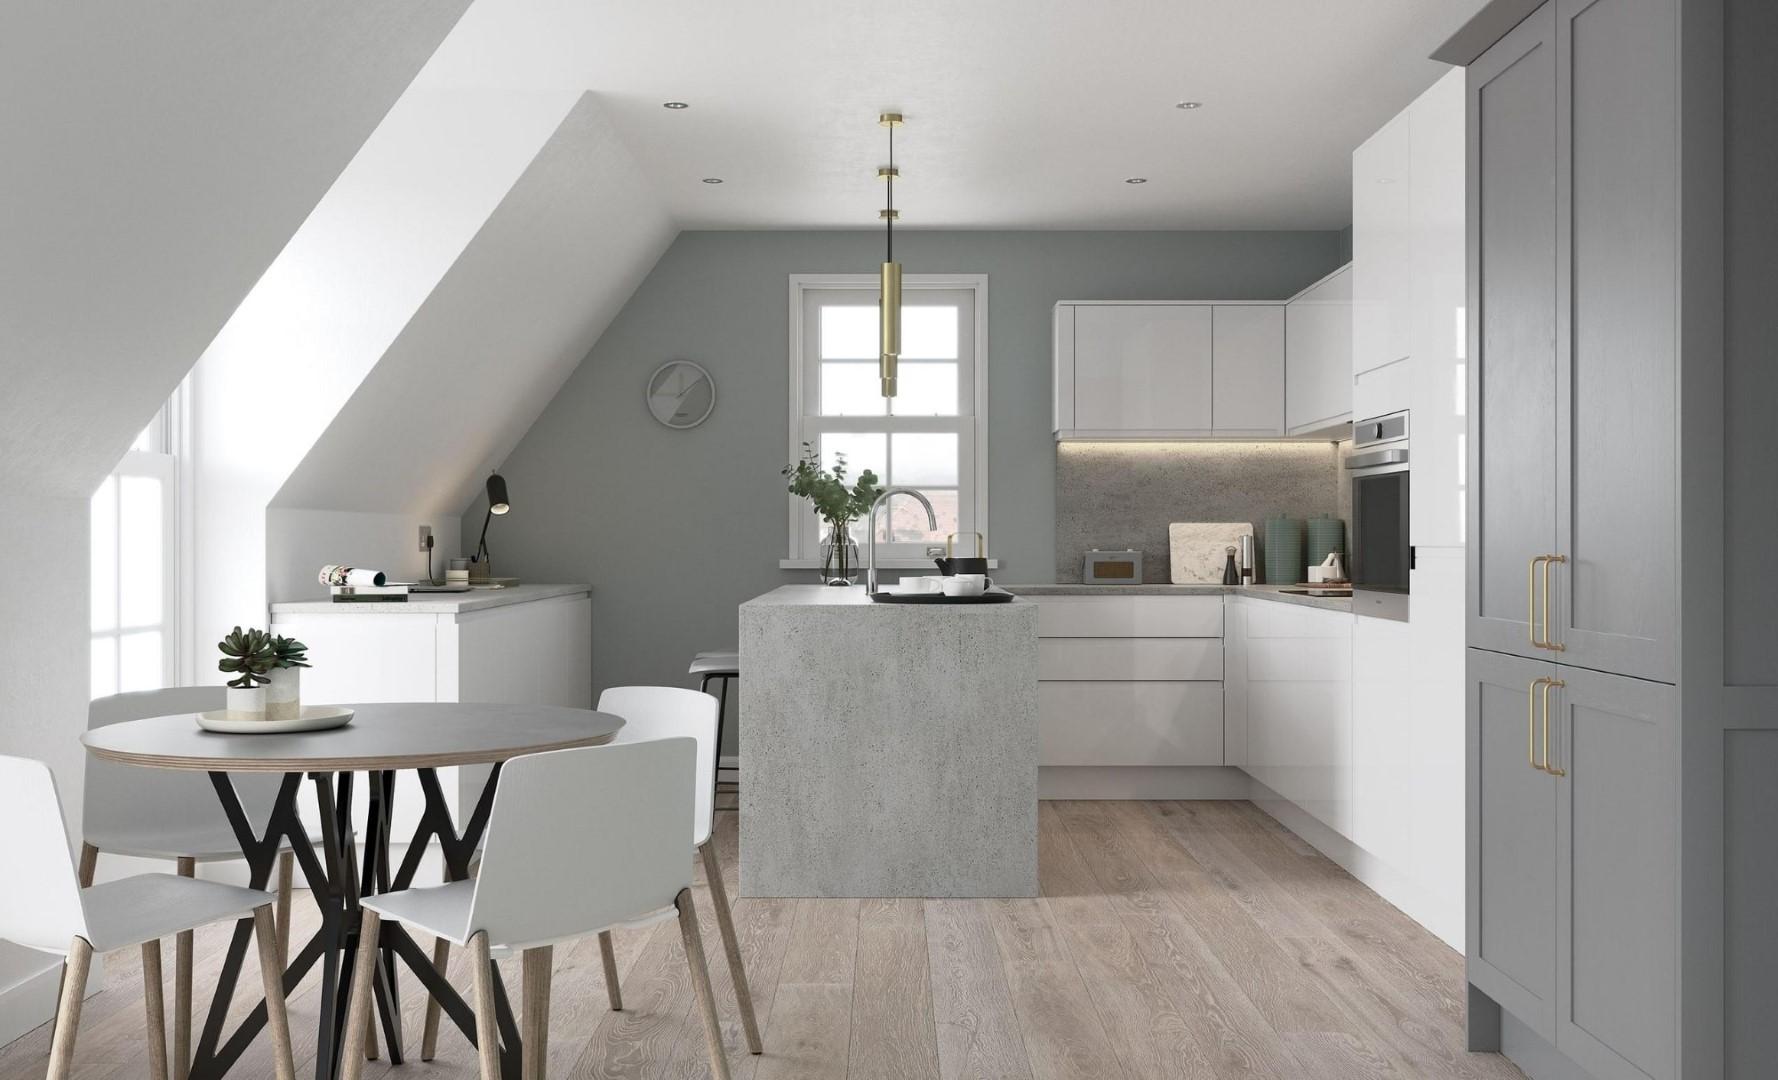 Modern Contemporary Kitchen - Strada Gloss White, Aldana Dust Grey - Kitchen Design - Alan Kelly Kitchens - Waterford